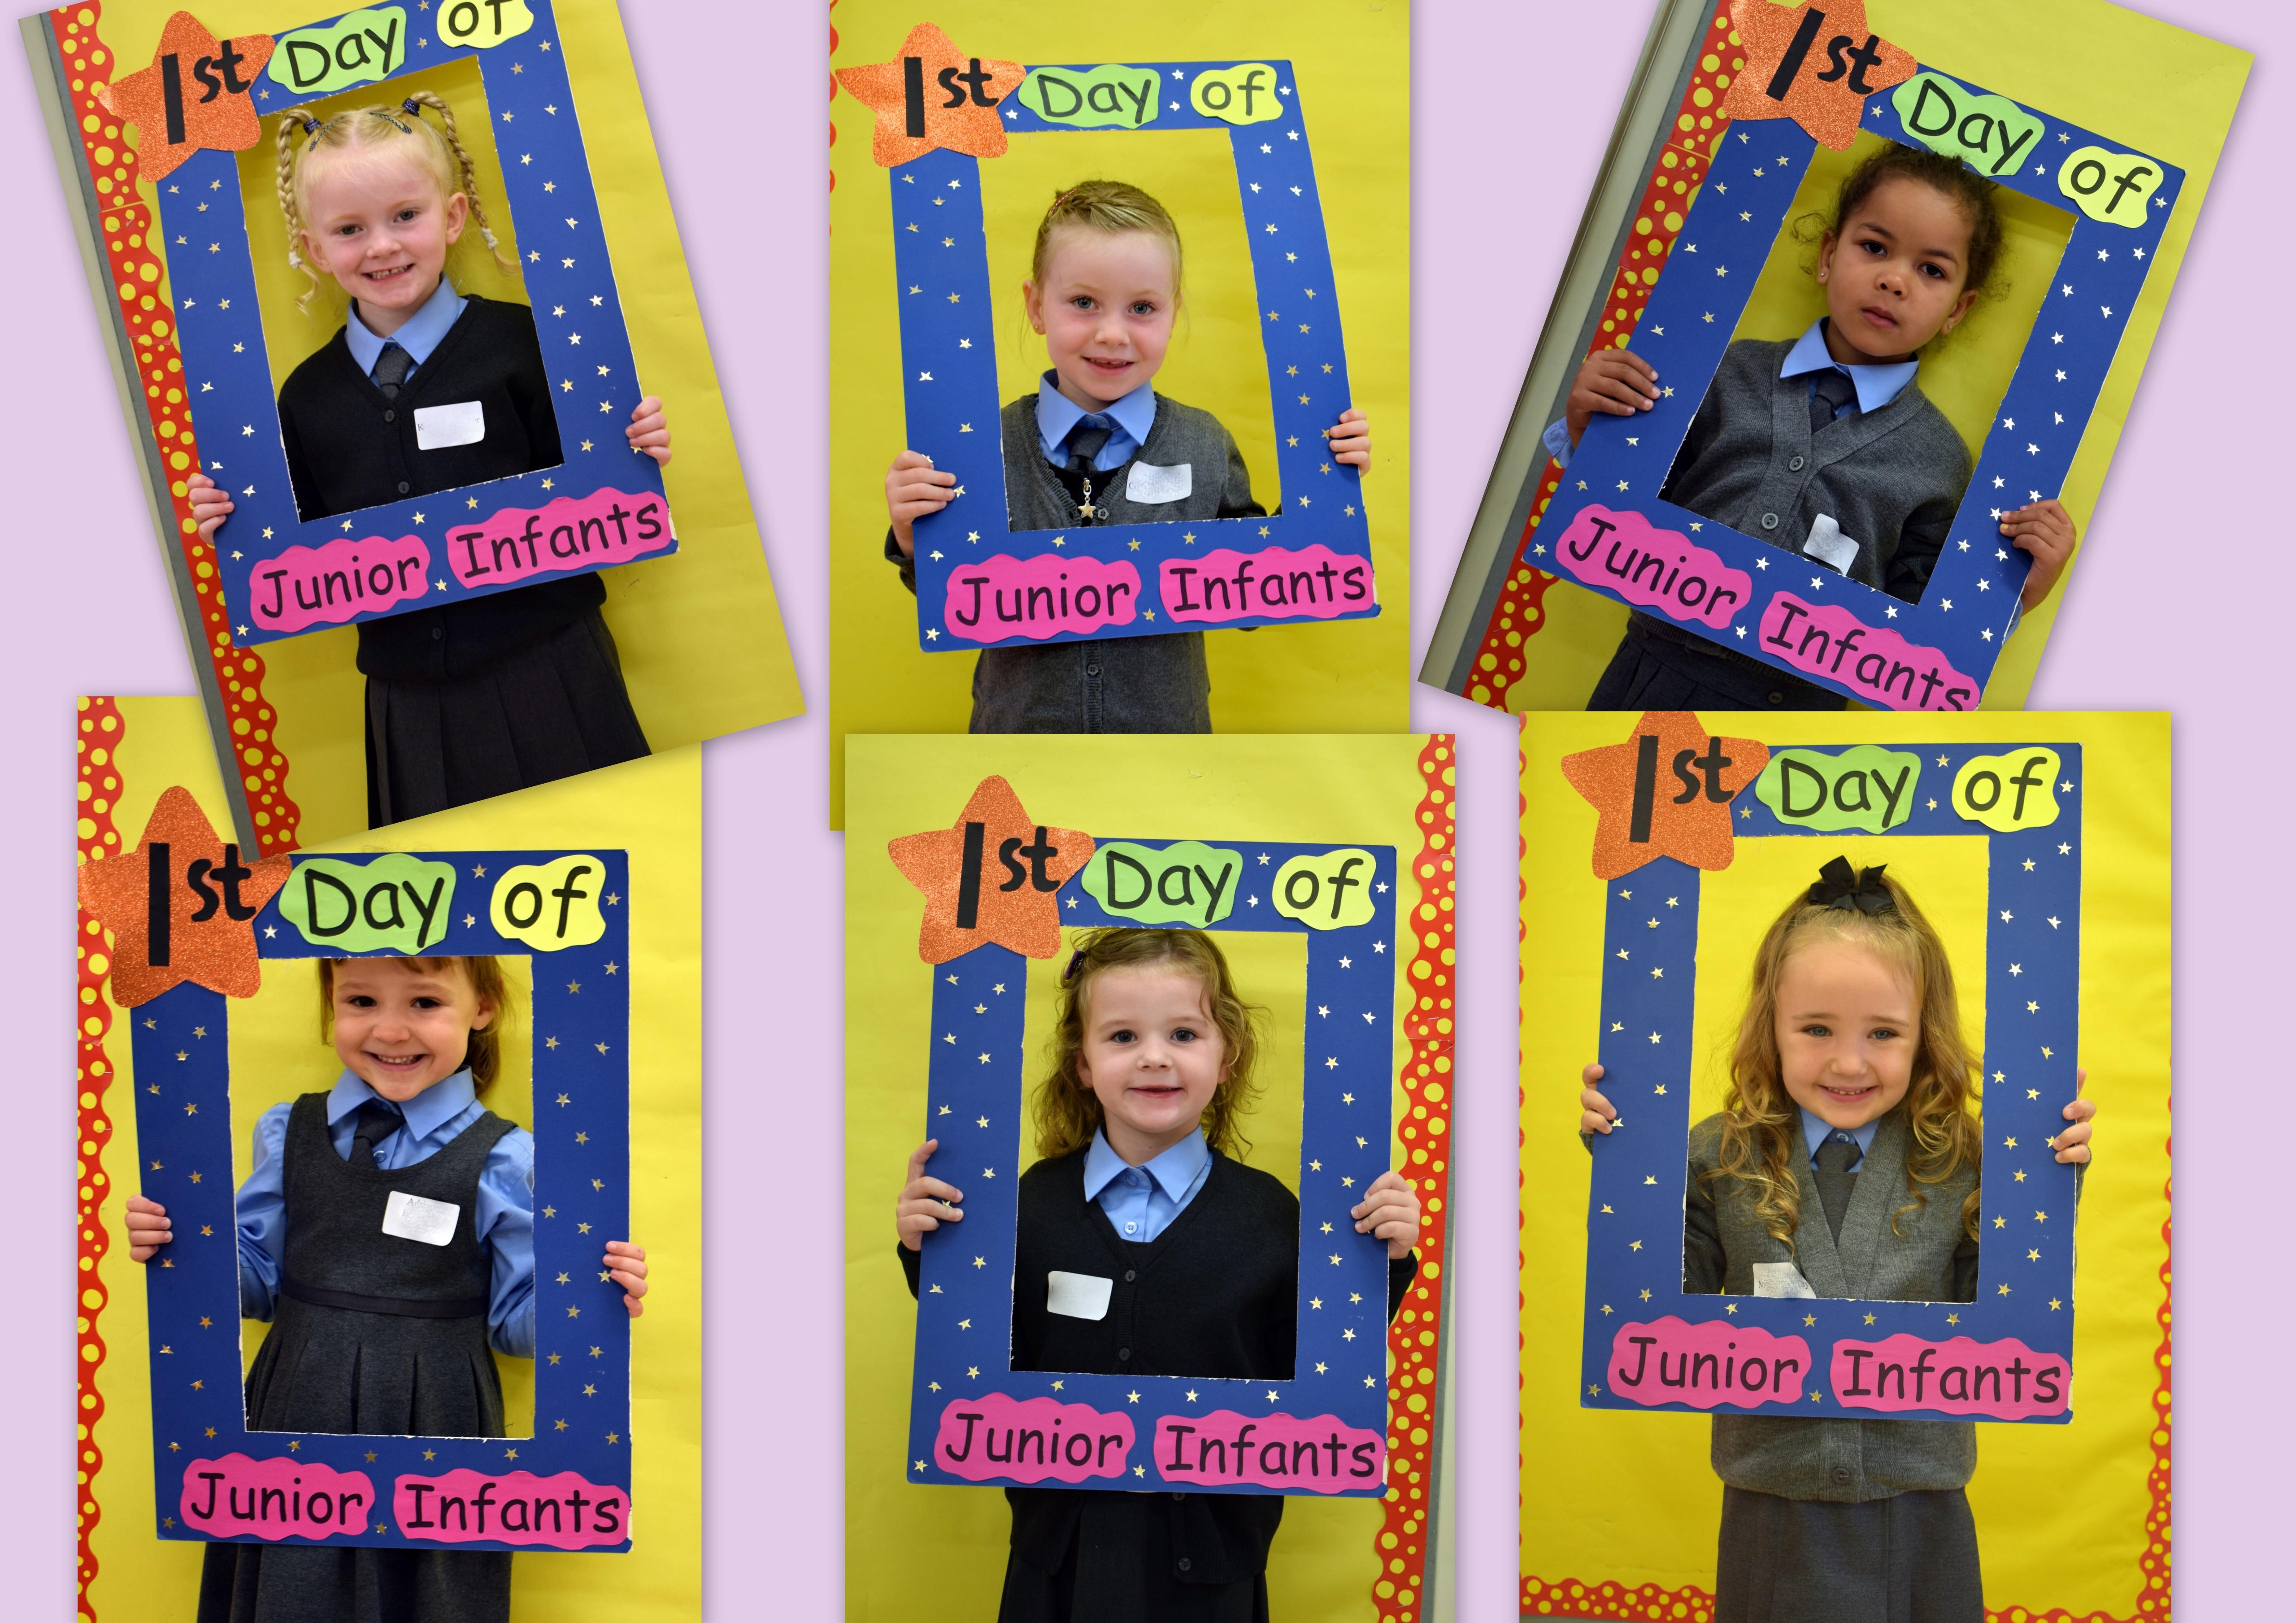 Junior Infants 20191 - First day in Junior Infants